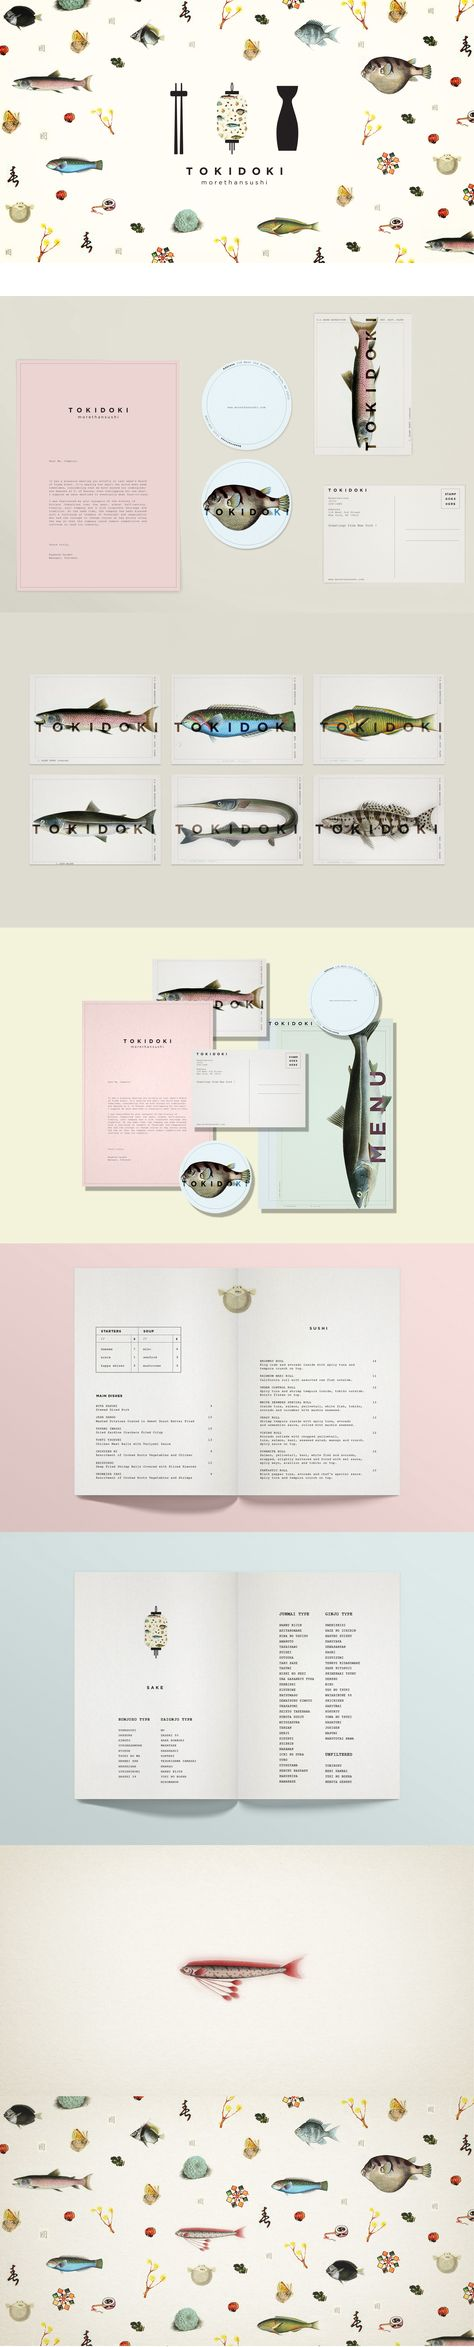 Branding, Art Direction & Graphic Design _Japanese Restaurant Corporate Design #corporatedesign